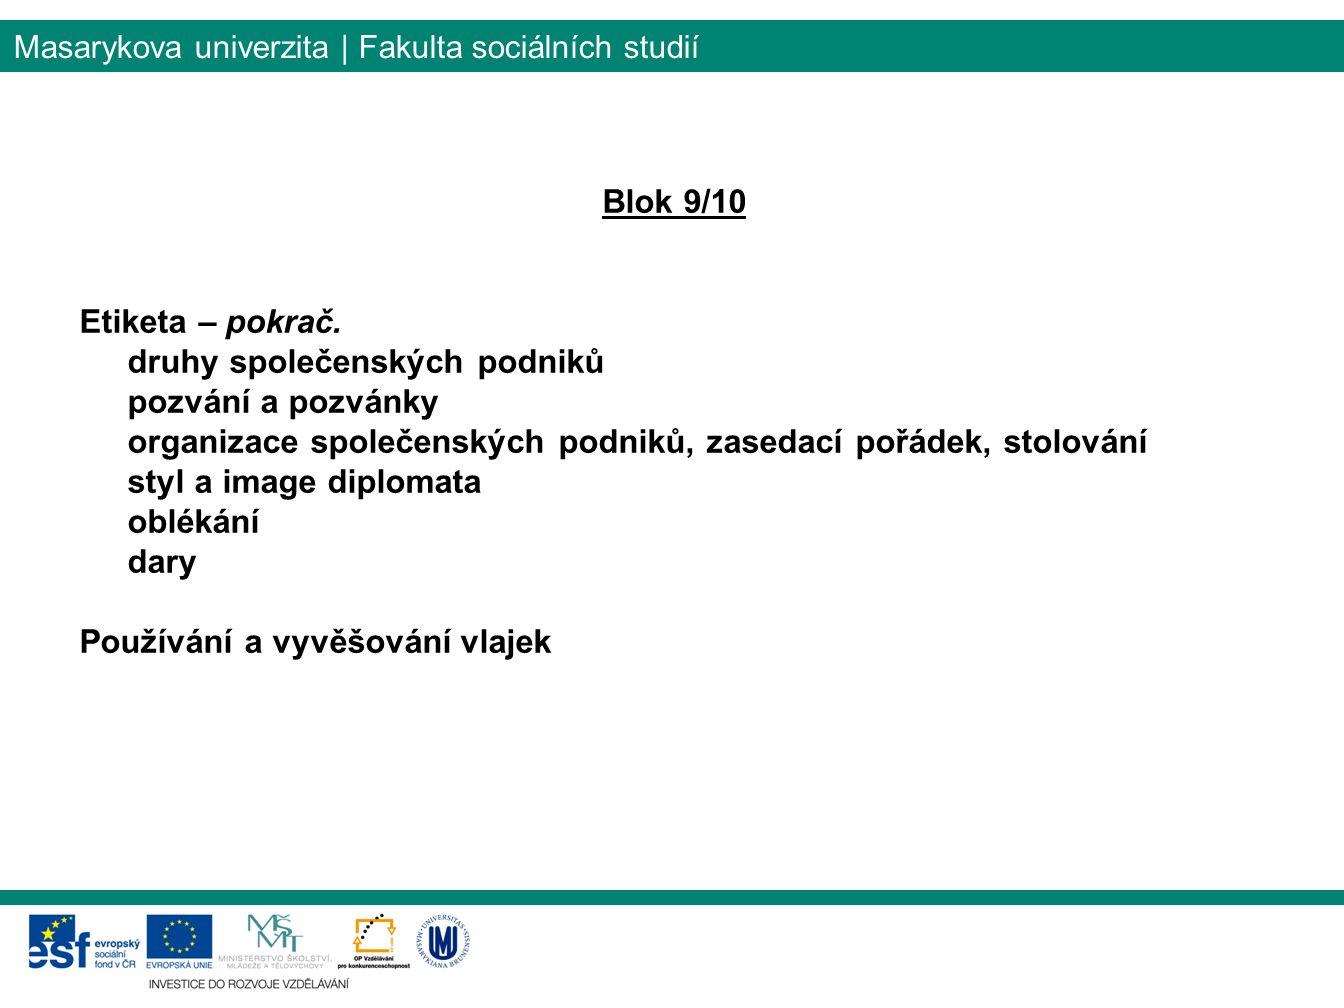 Masarykova univerzita | Fakulta sociálních studií Blok 9/10 Etiketa – pokrač.